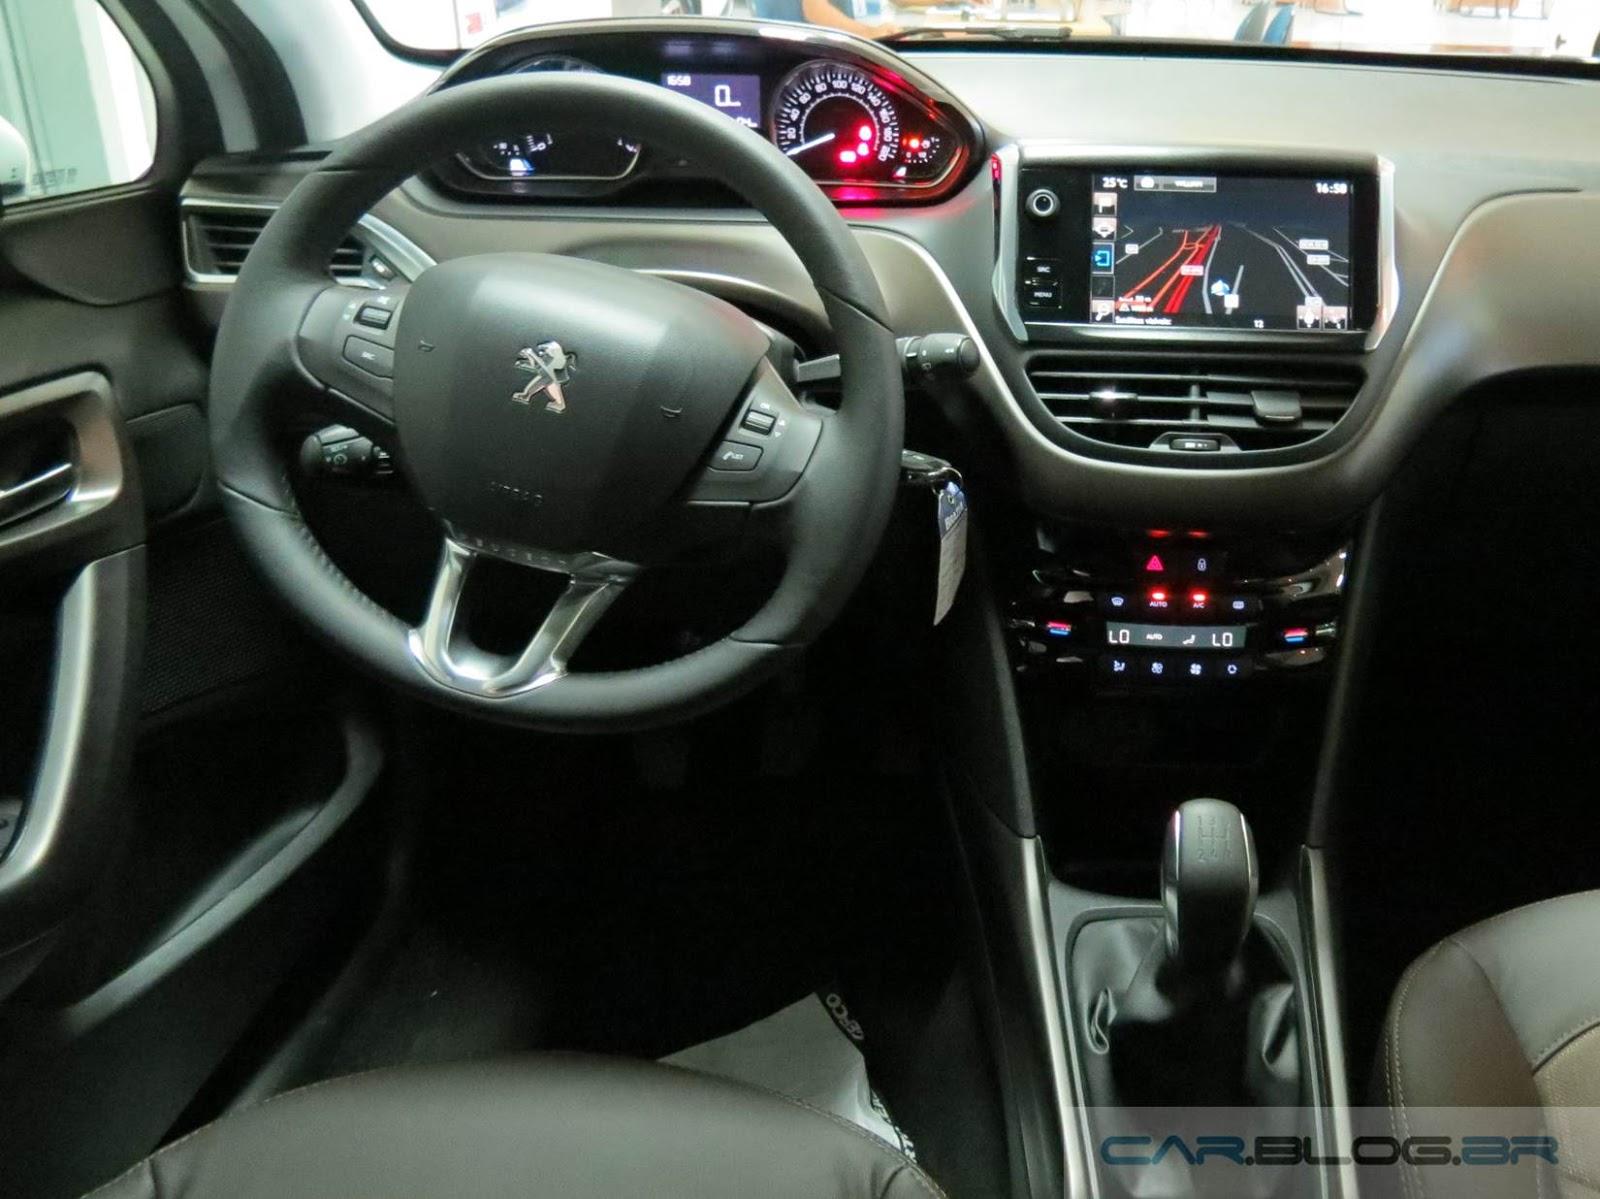 Peugeot 2008 2019 >> Peugeot 2008 Automático: preço, desempenho e consumo | CAR.BLOG.BR